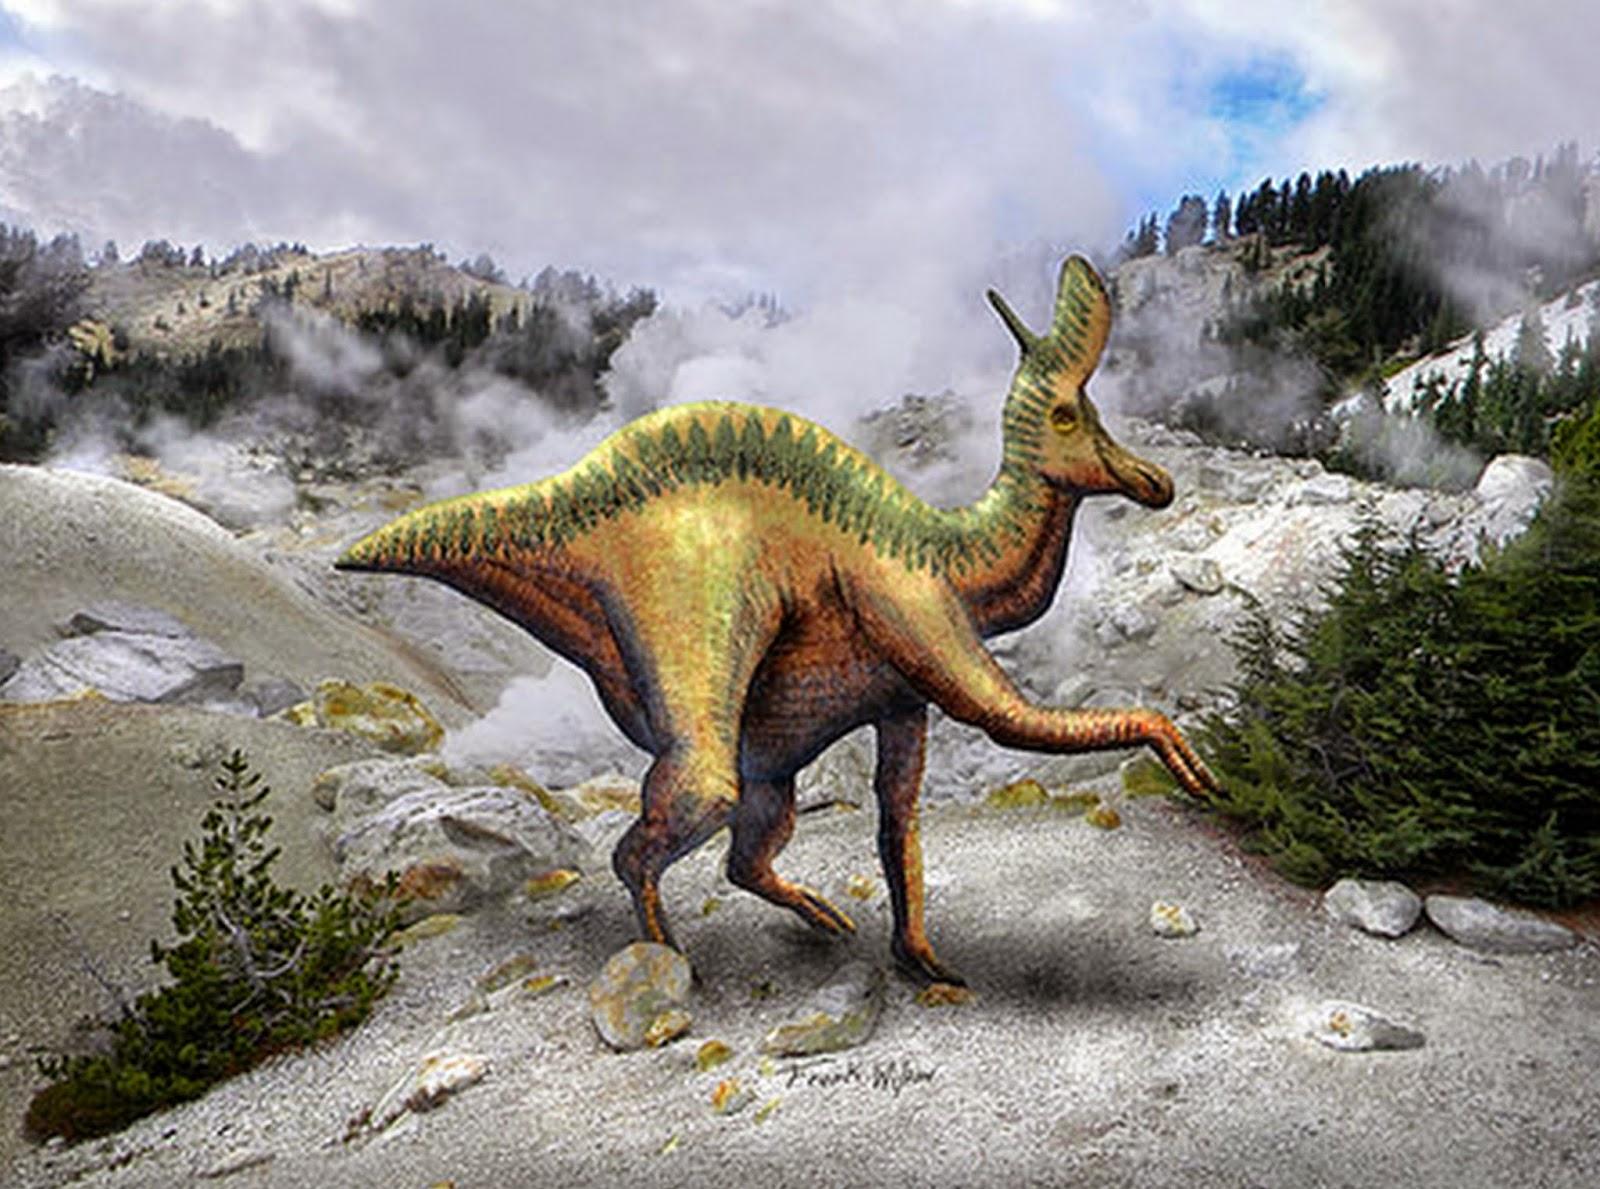 paisajes-con-dinosaurios-pintados-al-oleo